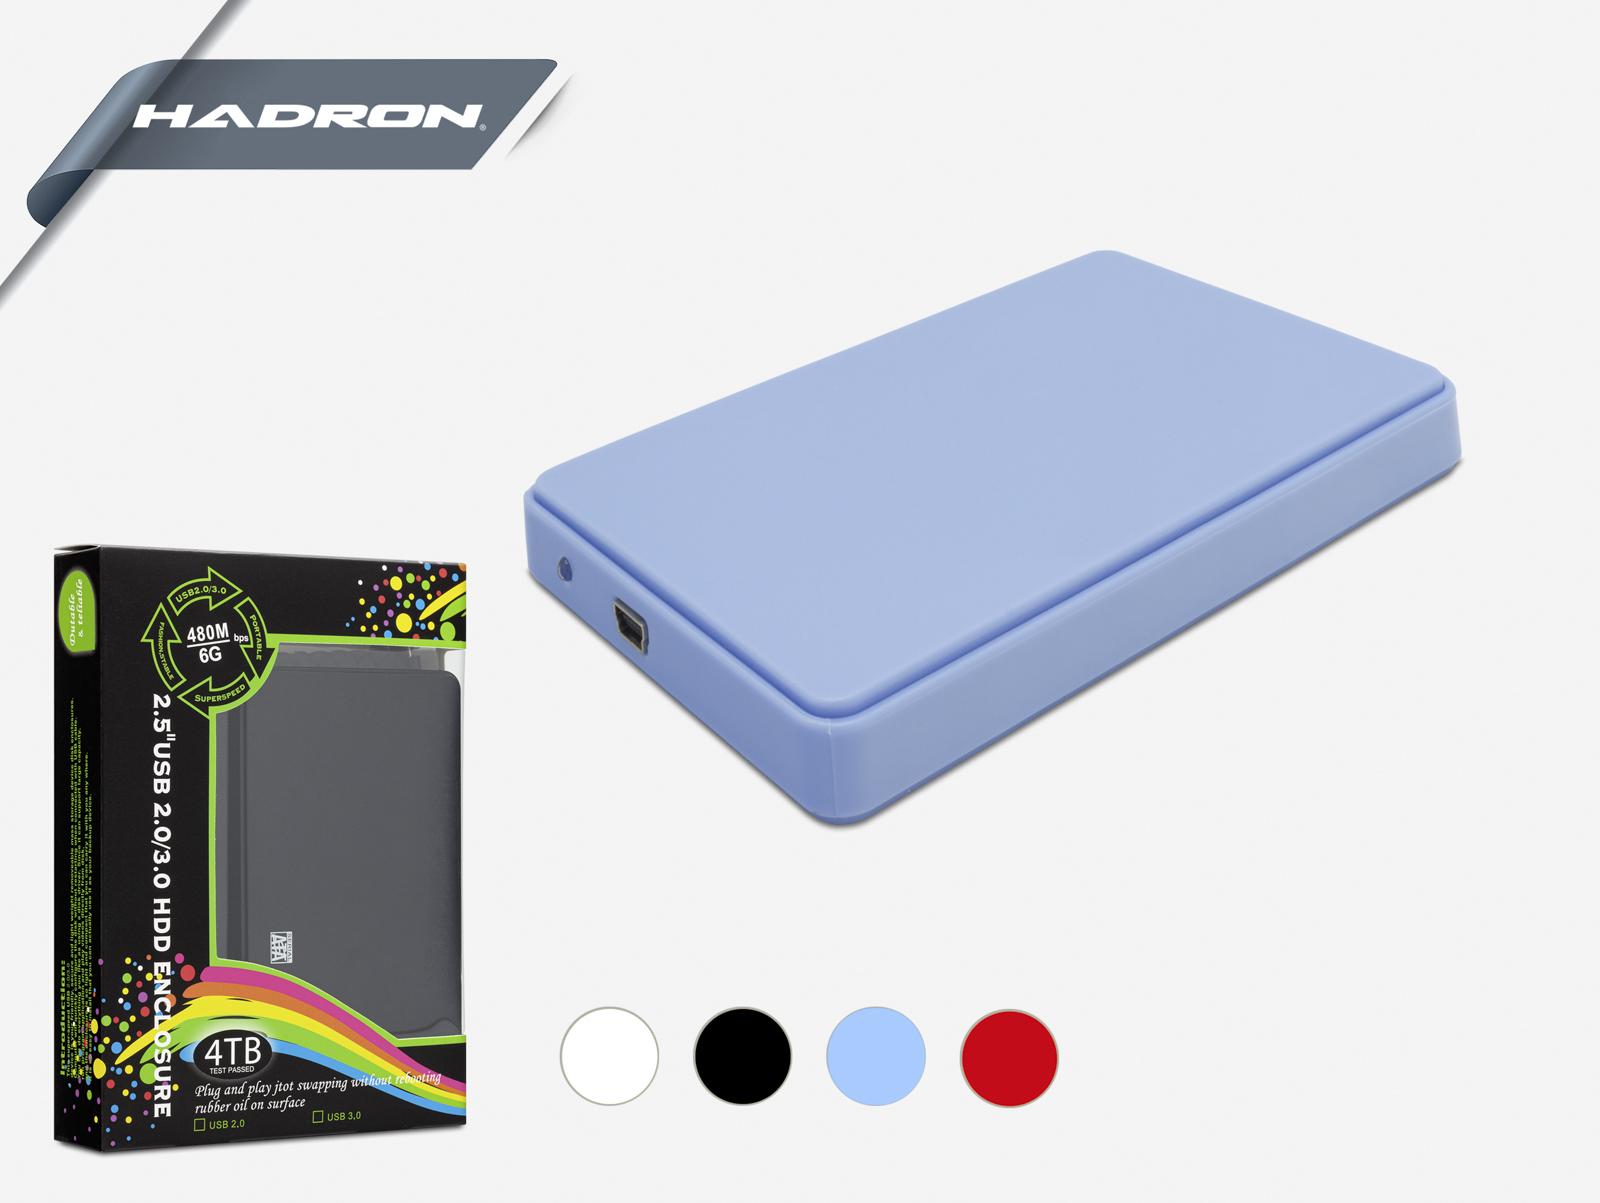 "Hadron Hd968 Usb 3.0 Sata 2.5"" Harddisk Kutusu"